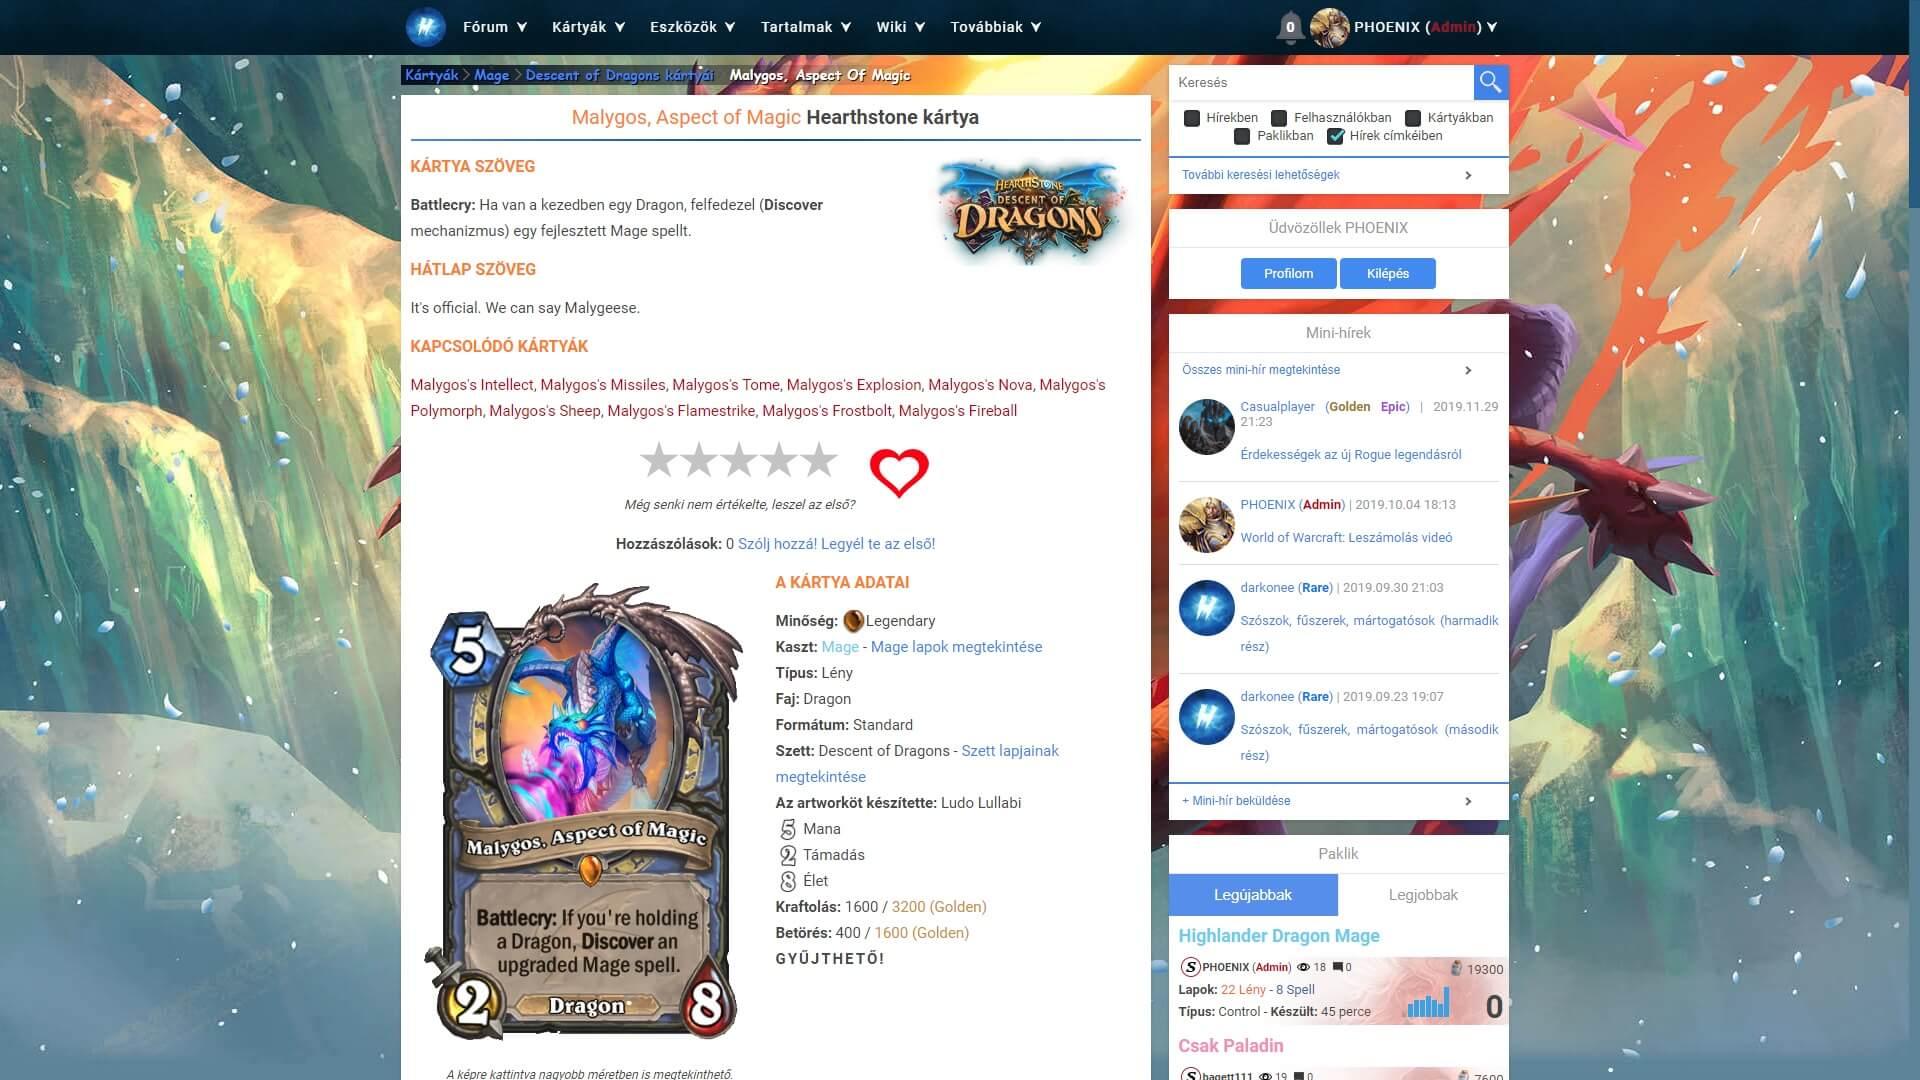 Malygos, Aspect of Magic Hearthstone kártya